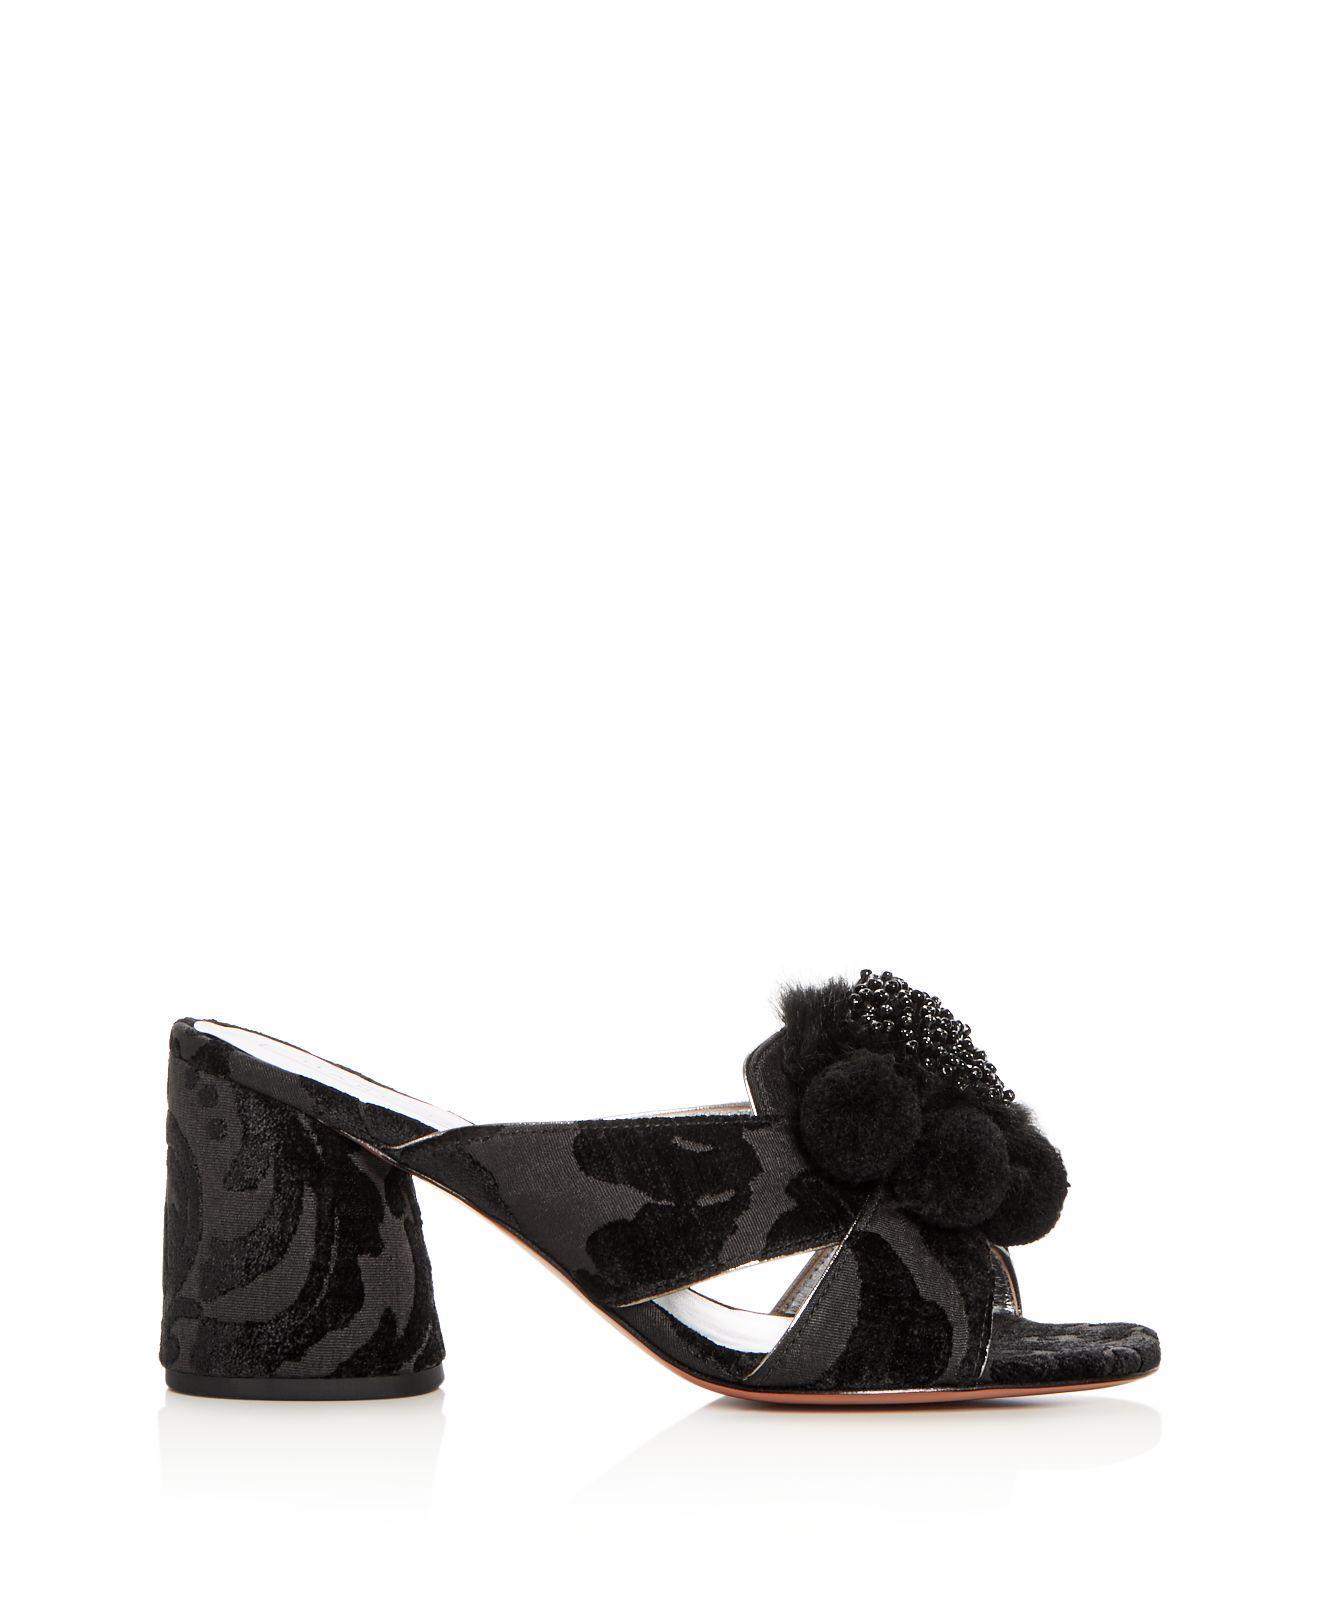 Marc Jacobs Women's Aurora Embellished Faux-Fur & Pom-Pom Block Heel Slide Sandals Fashion Style Online Sale Shop For Outlet Get Authentic mRtS5UMFFt